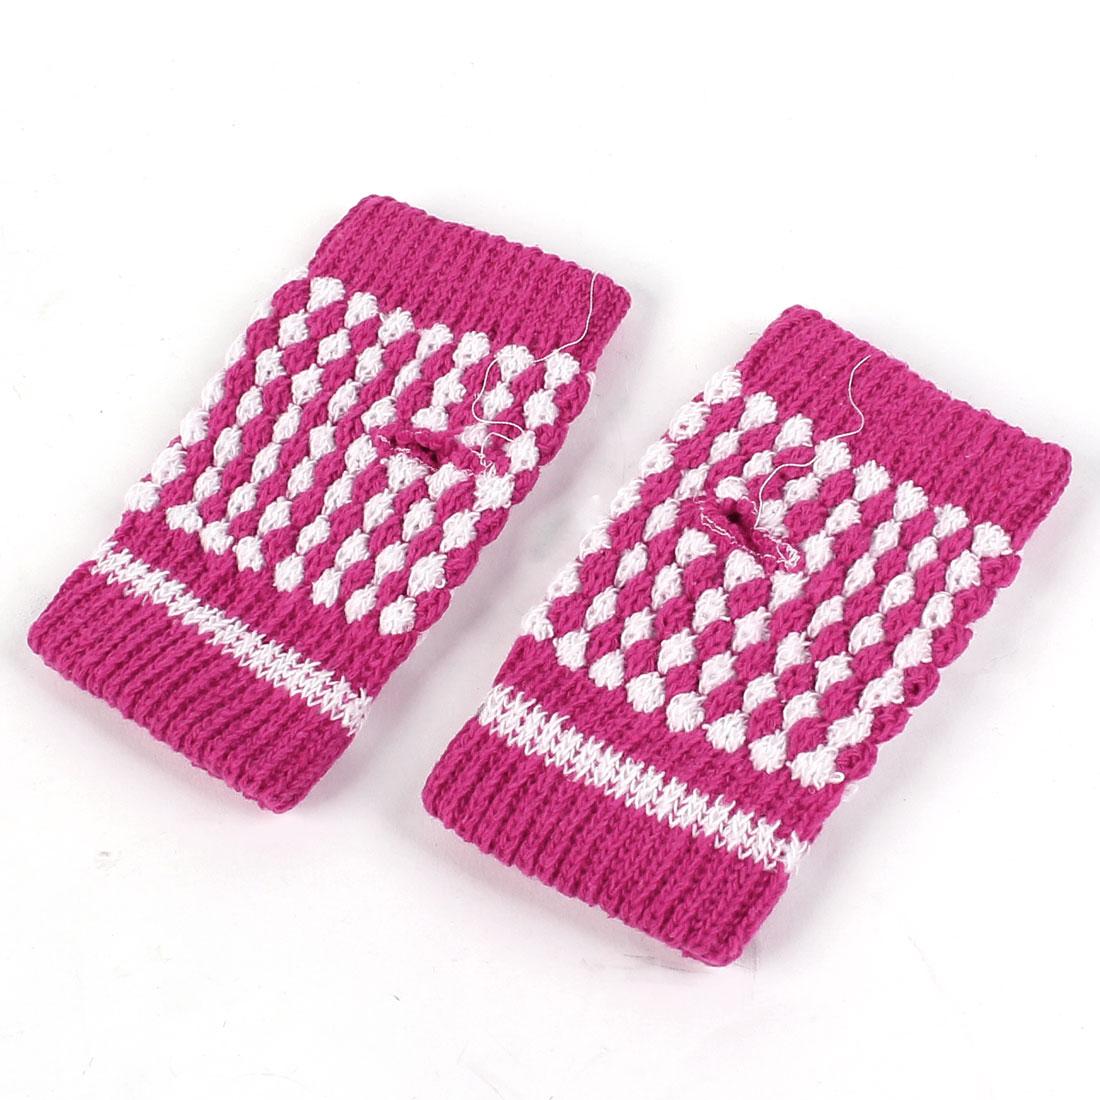 Ladies Winter Knitted Elastic Cuff Palm Warm Fingerless Gloves Fuchsia Pair